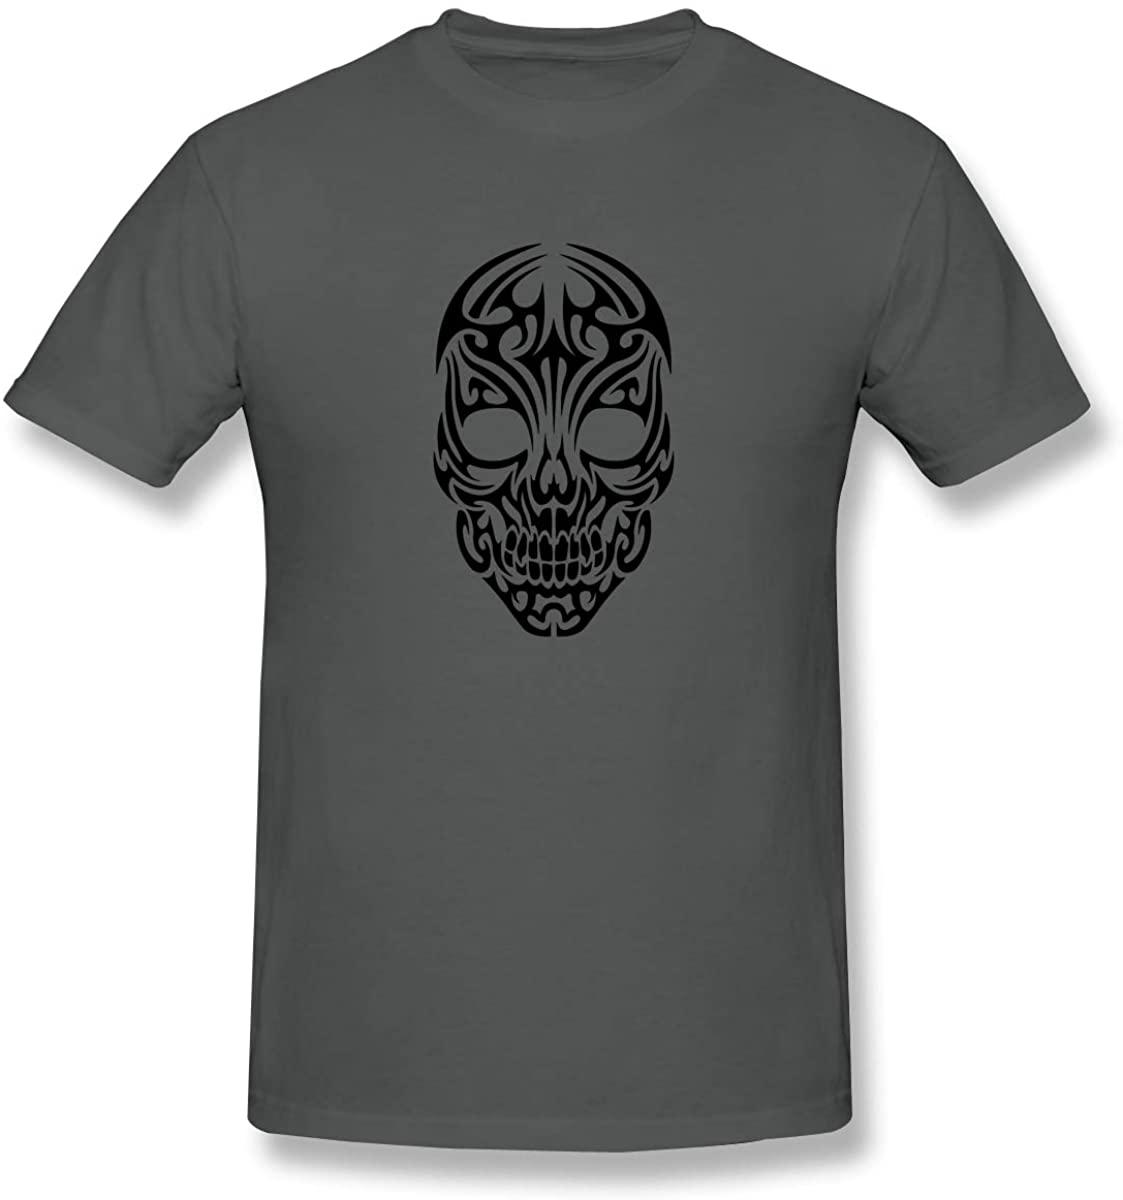 XIVEIER New Tribal Skull Tattoo Mexican Style T-Shirt for Boyfriend Deep Heather M.